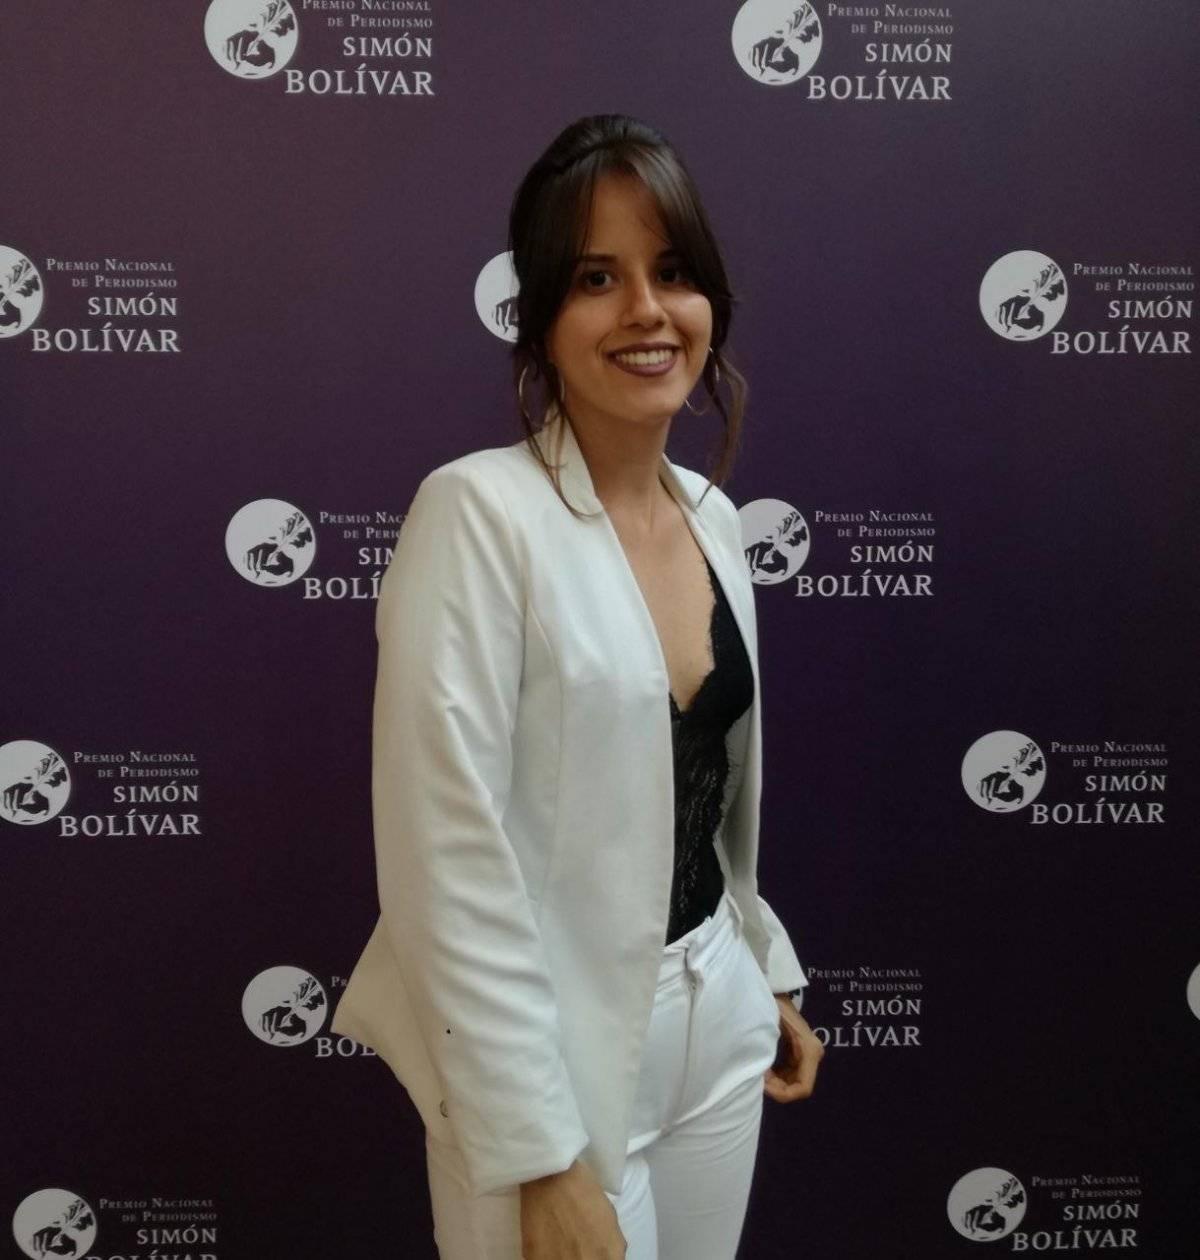 Lina Uribe